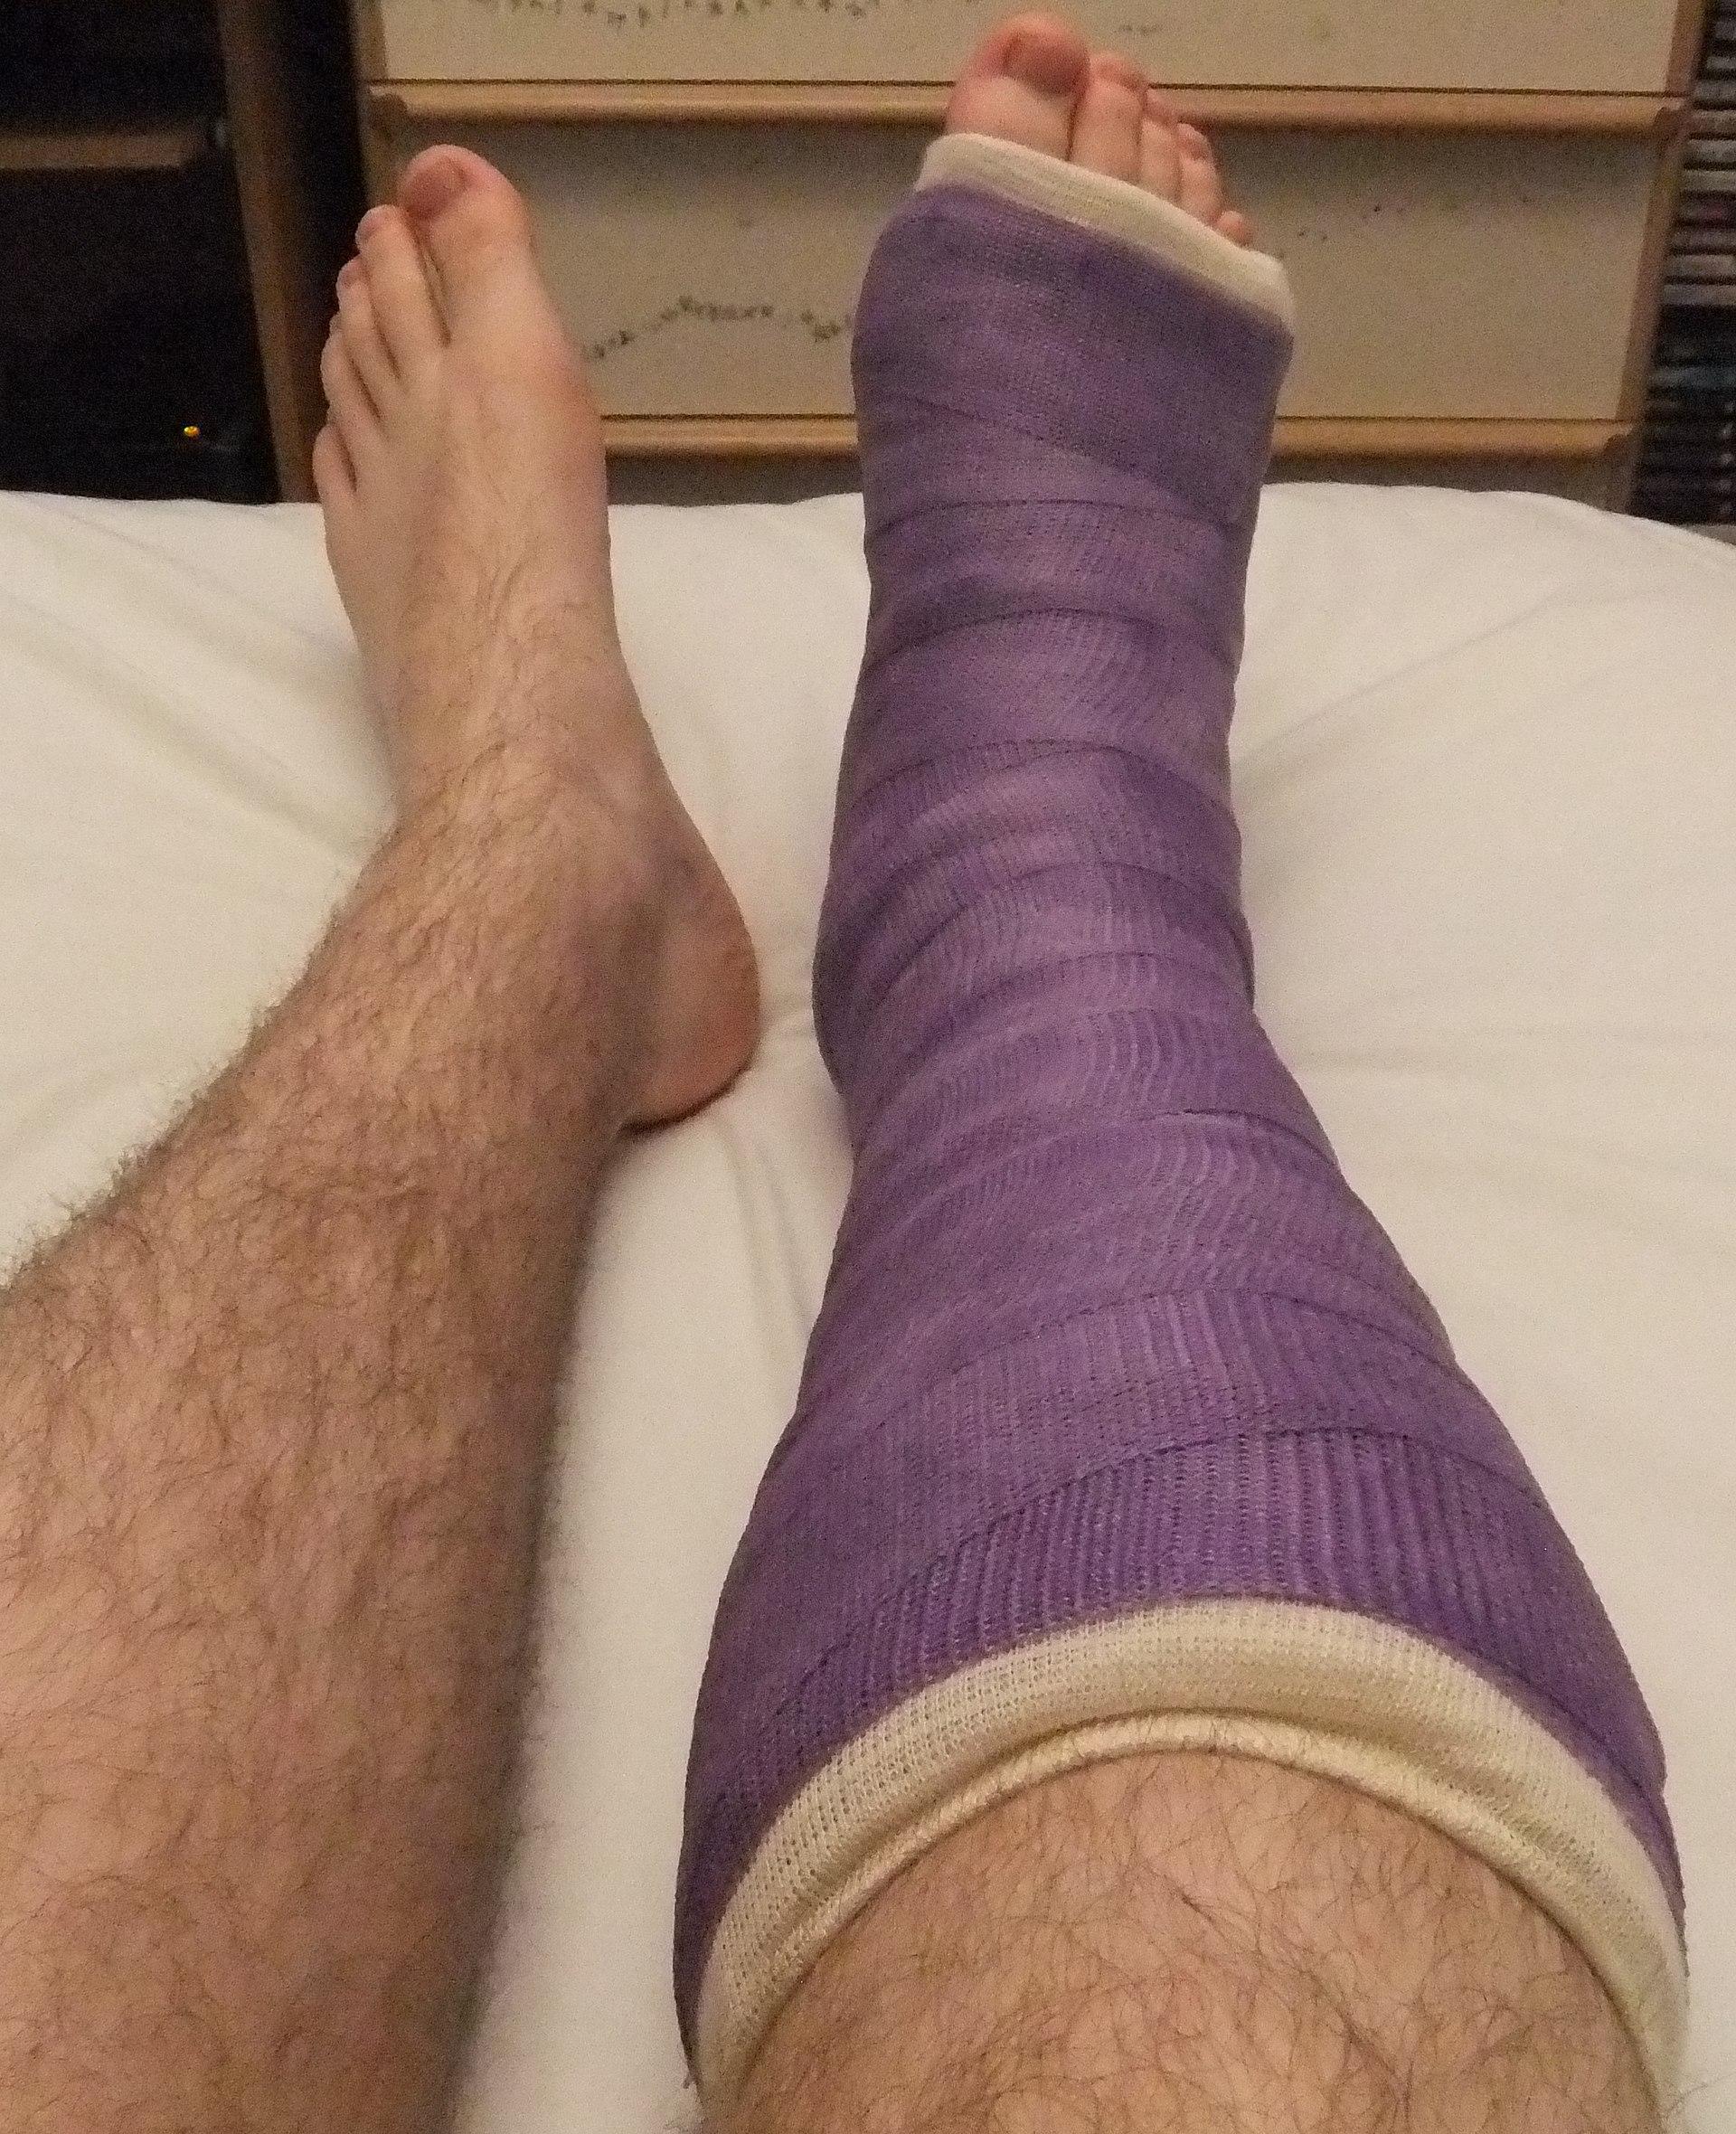 Orthopedic cast  Wikipedia